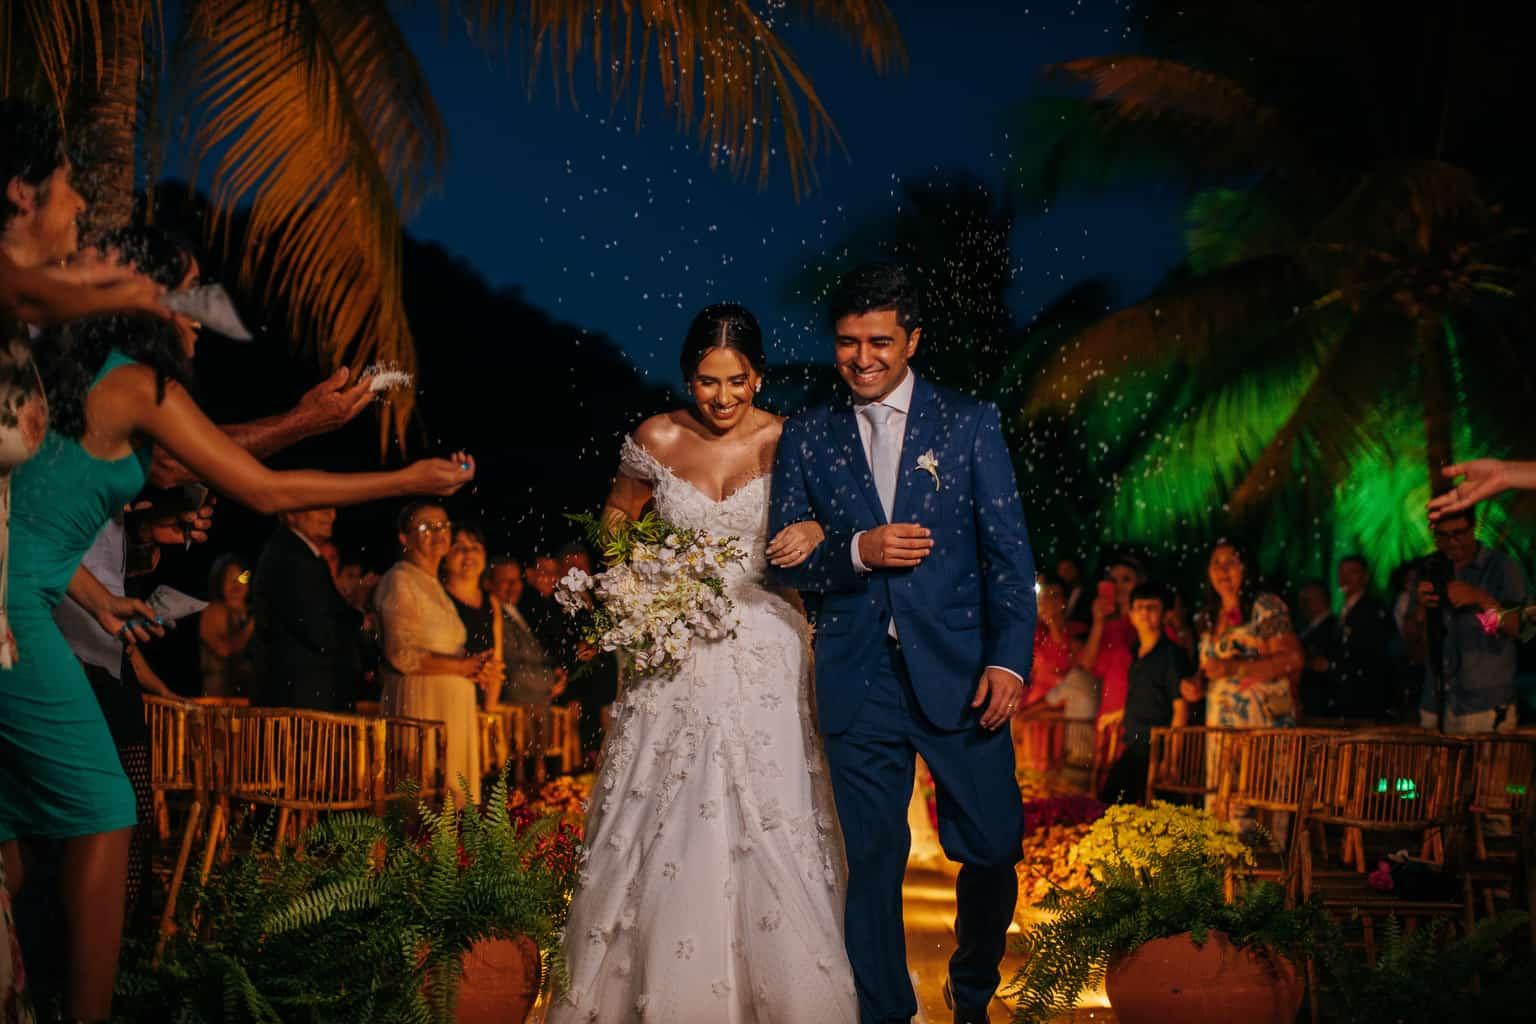 Casamento-Gardenia-e-Marcos-Antonio-Paulo-Bezerra-Joao-Curvelo-Carol-Maiorano-932-cerimonia